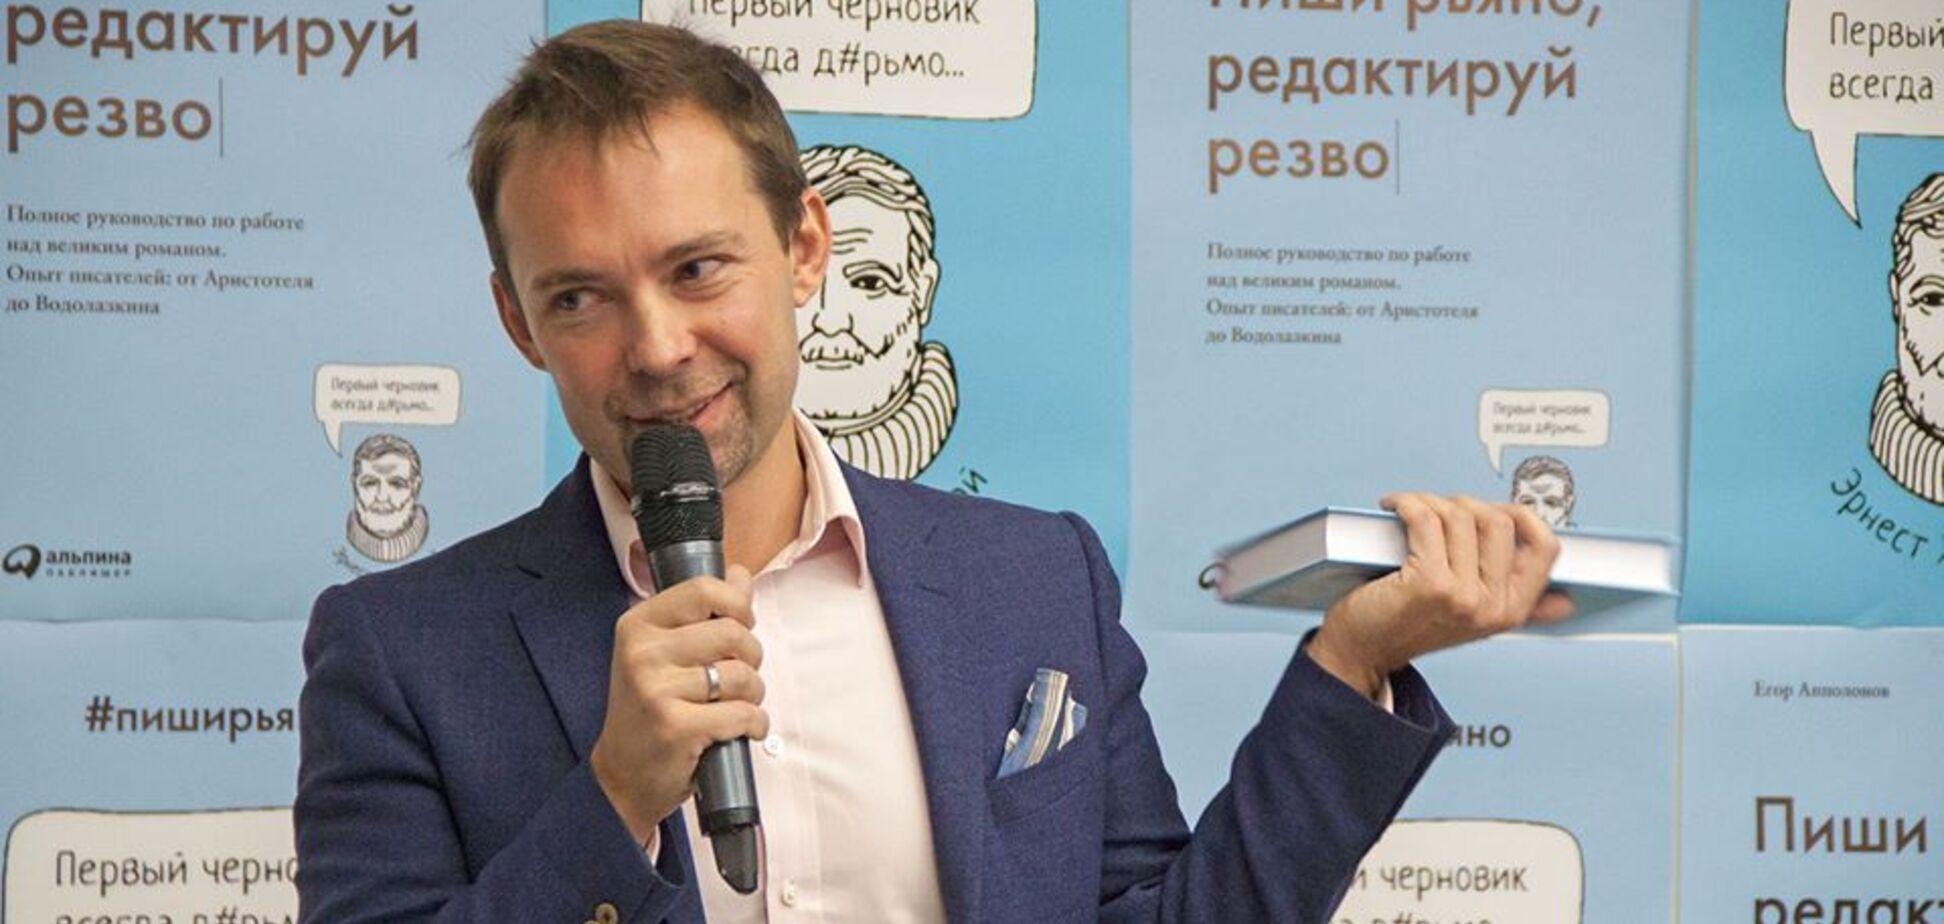 Єгор Апполонов